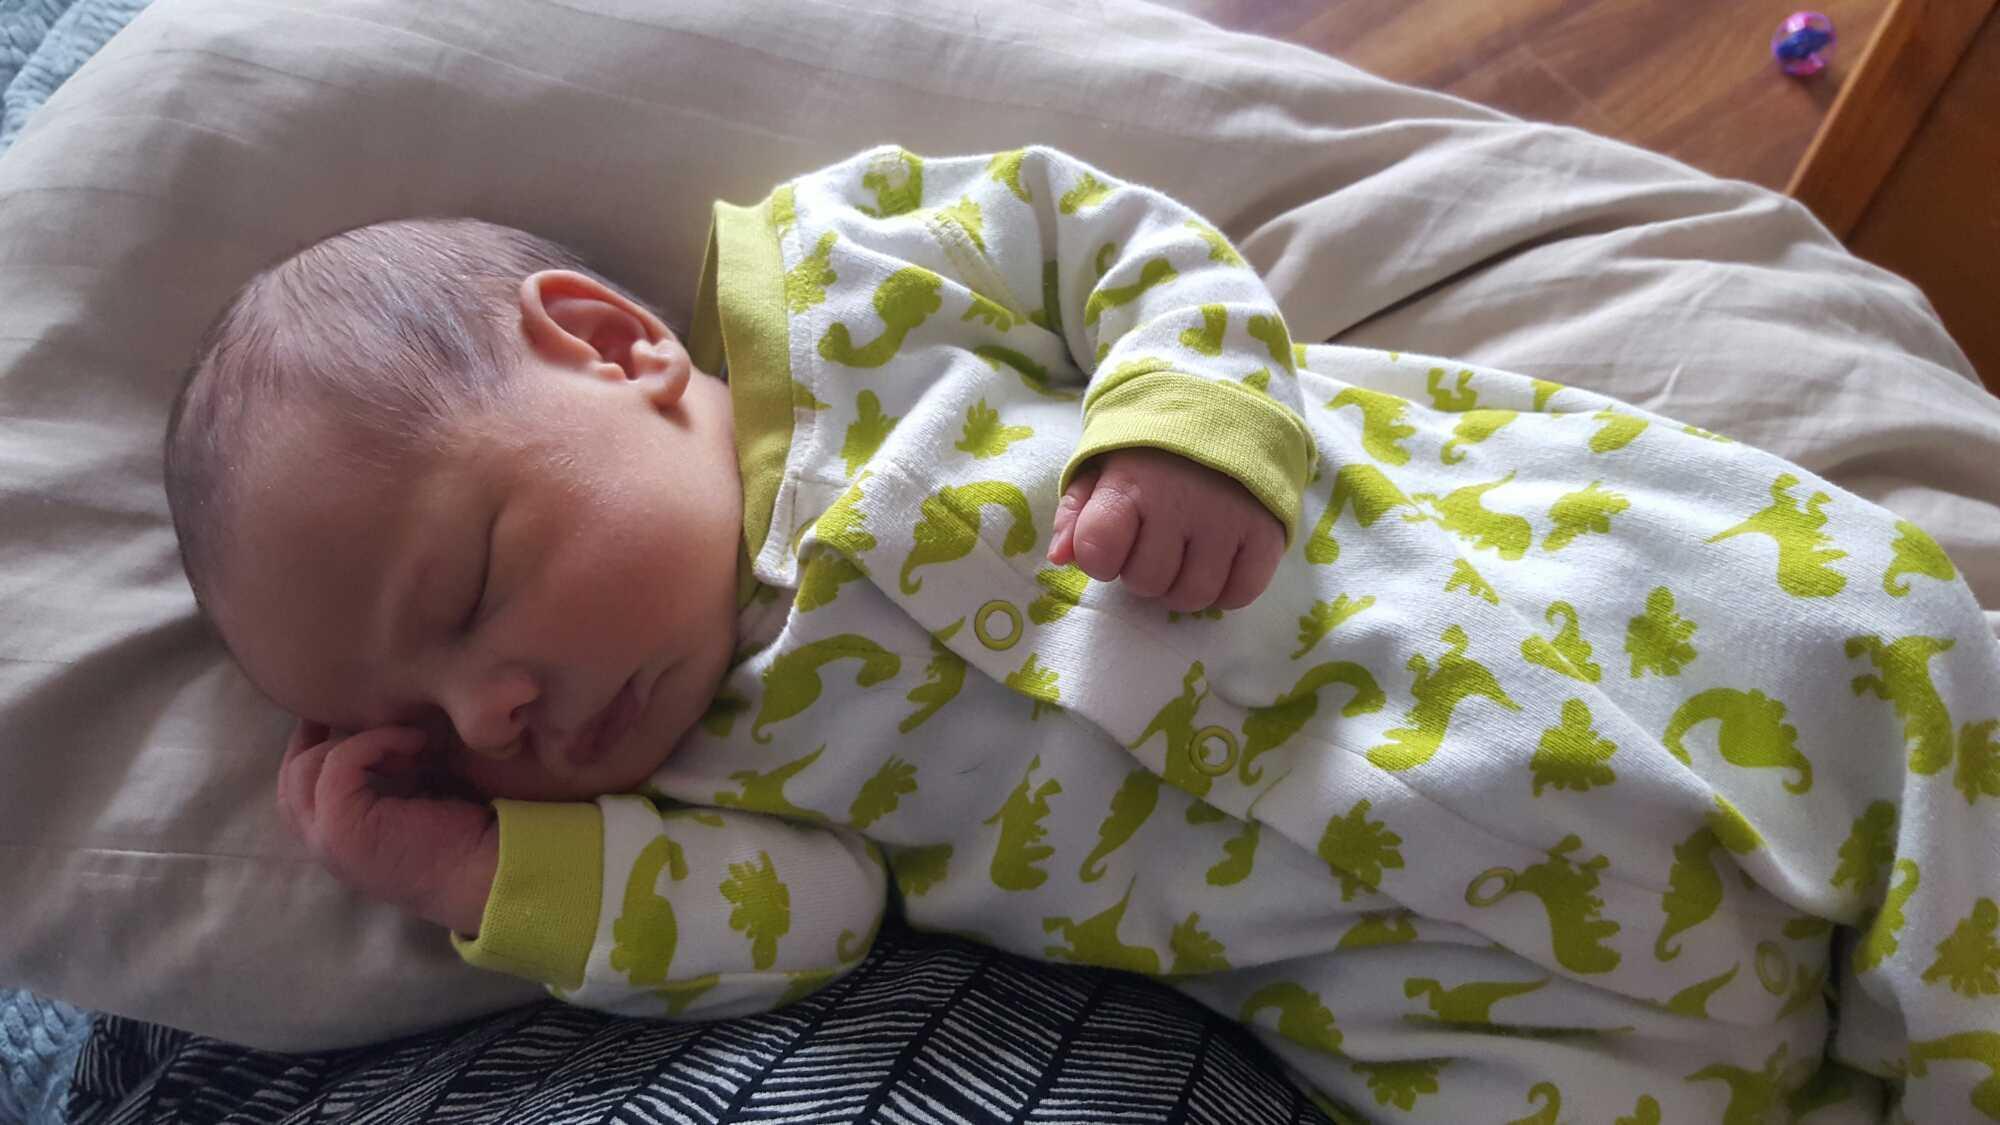 Breastfeeding, issues, lactation consultant, nursing, newborn